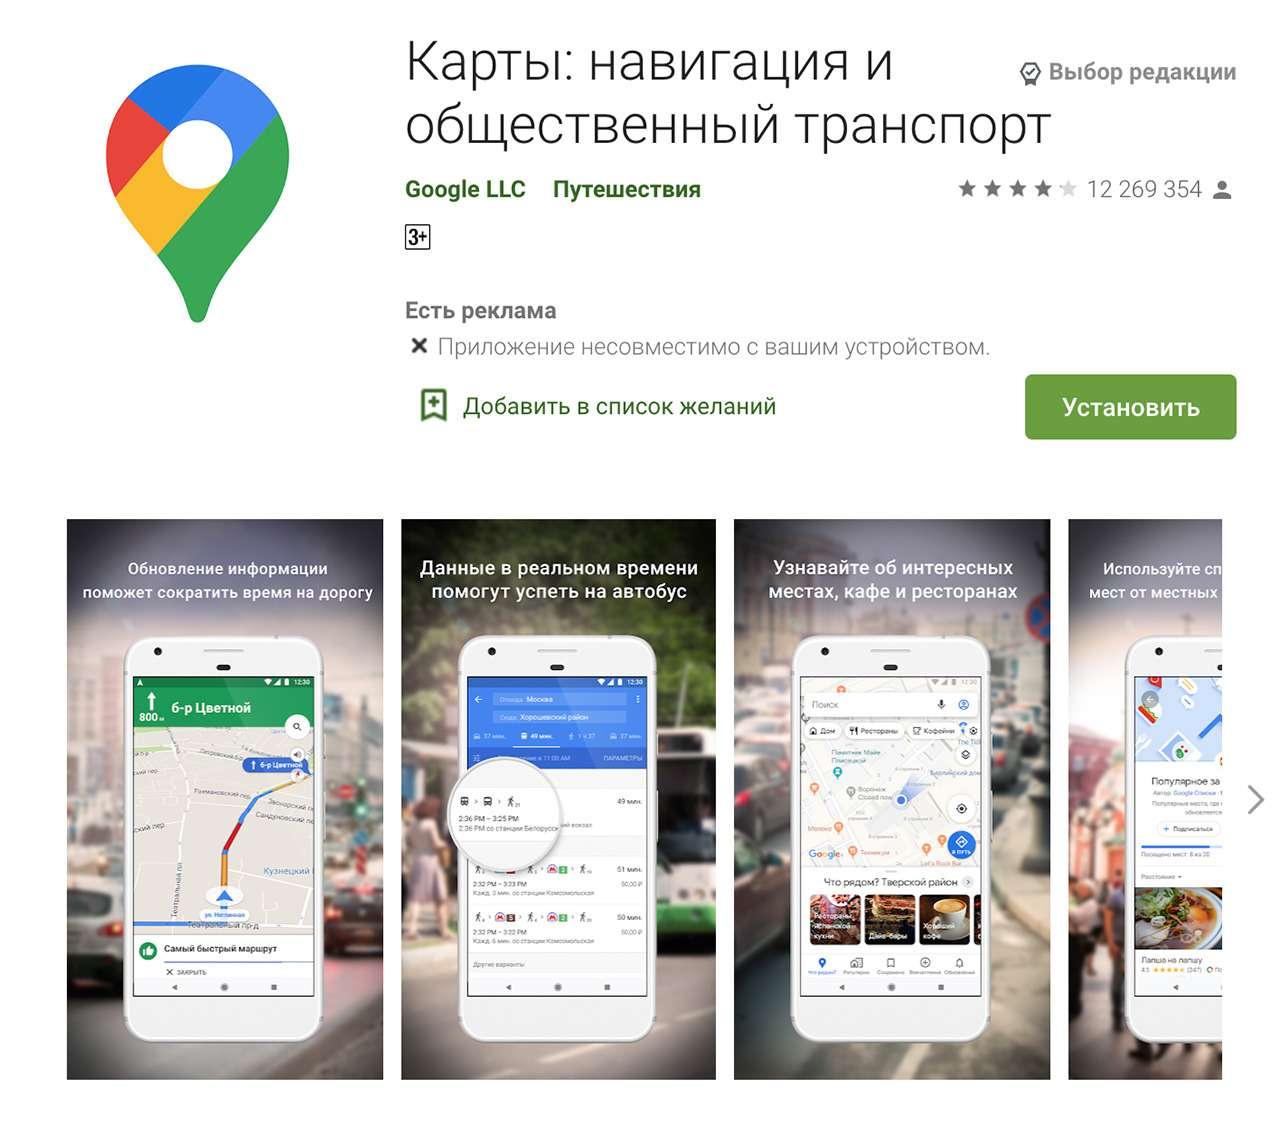 6 альтернатив Яндекс.Навигатору. Выберите свою— фото 1195242